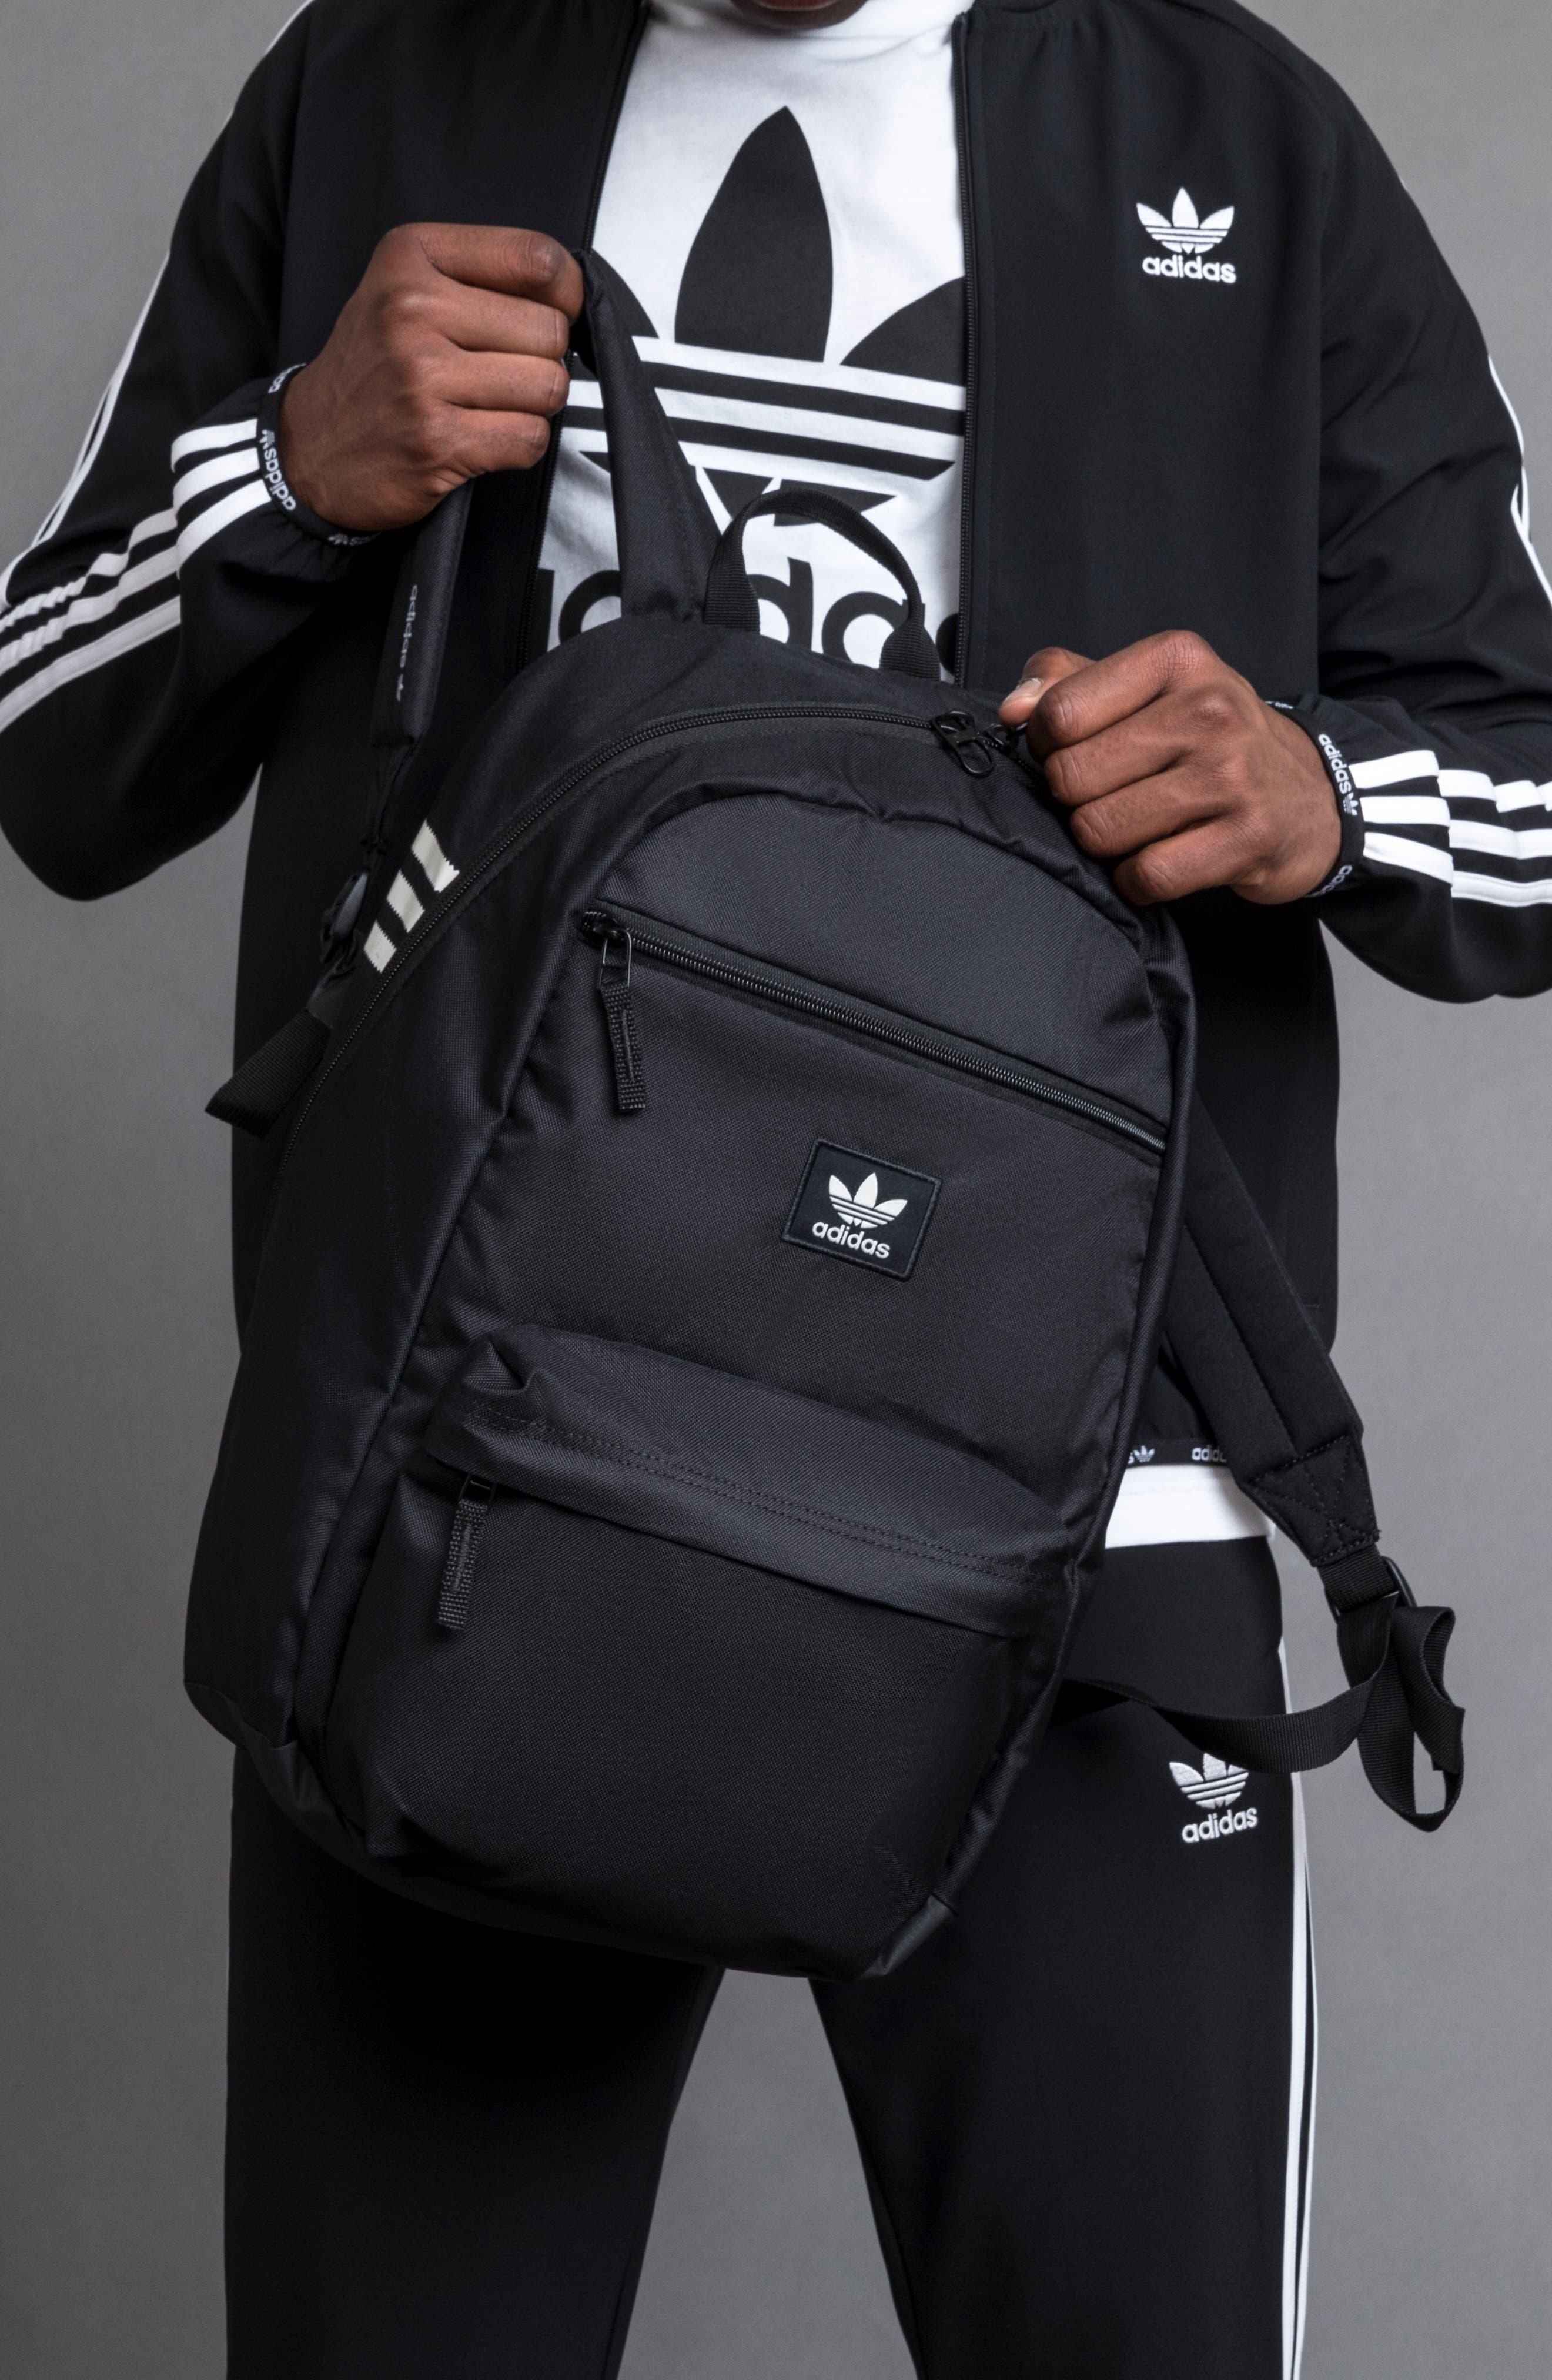 ADIDAS ORIGINALS,                             Nationals Backpack,                             Alternate thumbnail 8, color,                             BLACK